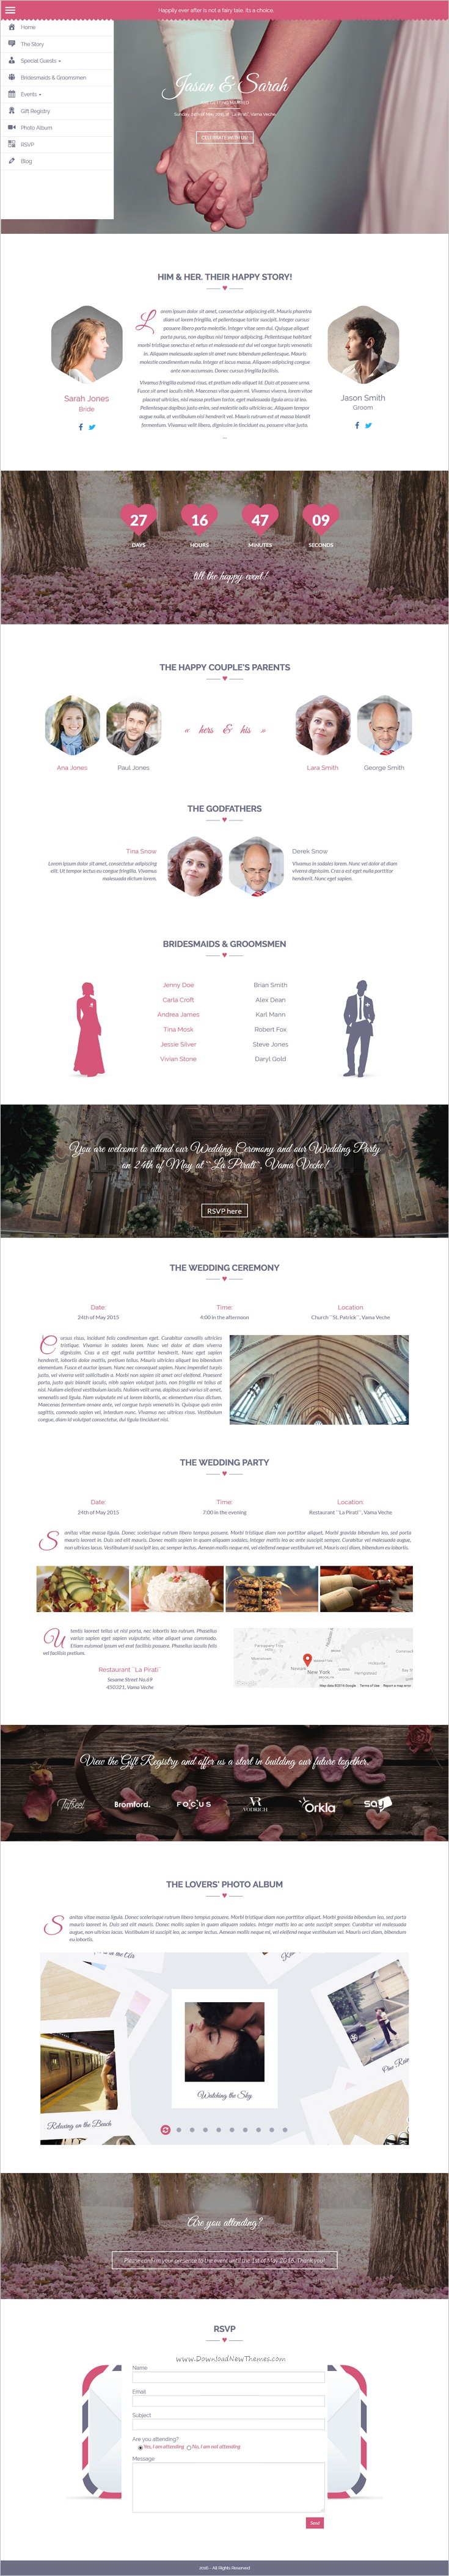 wedding invitation template themeforest%0A Amor is beautifully design responsive  WordPress theme for  webdesign  perfect  wedding invitation website